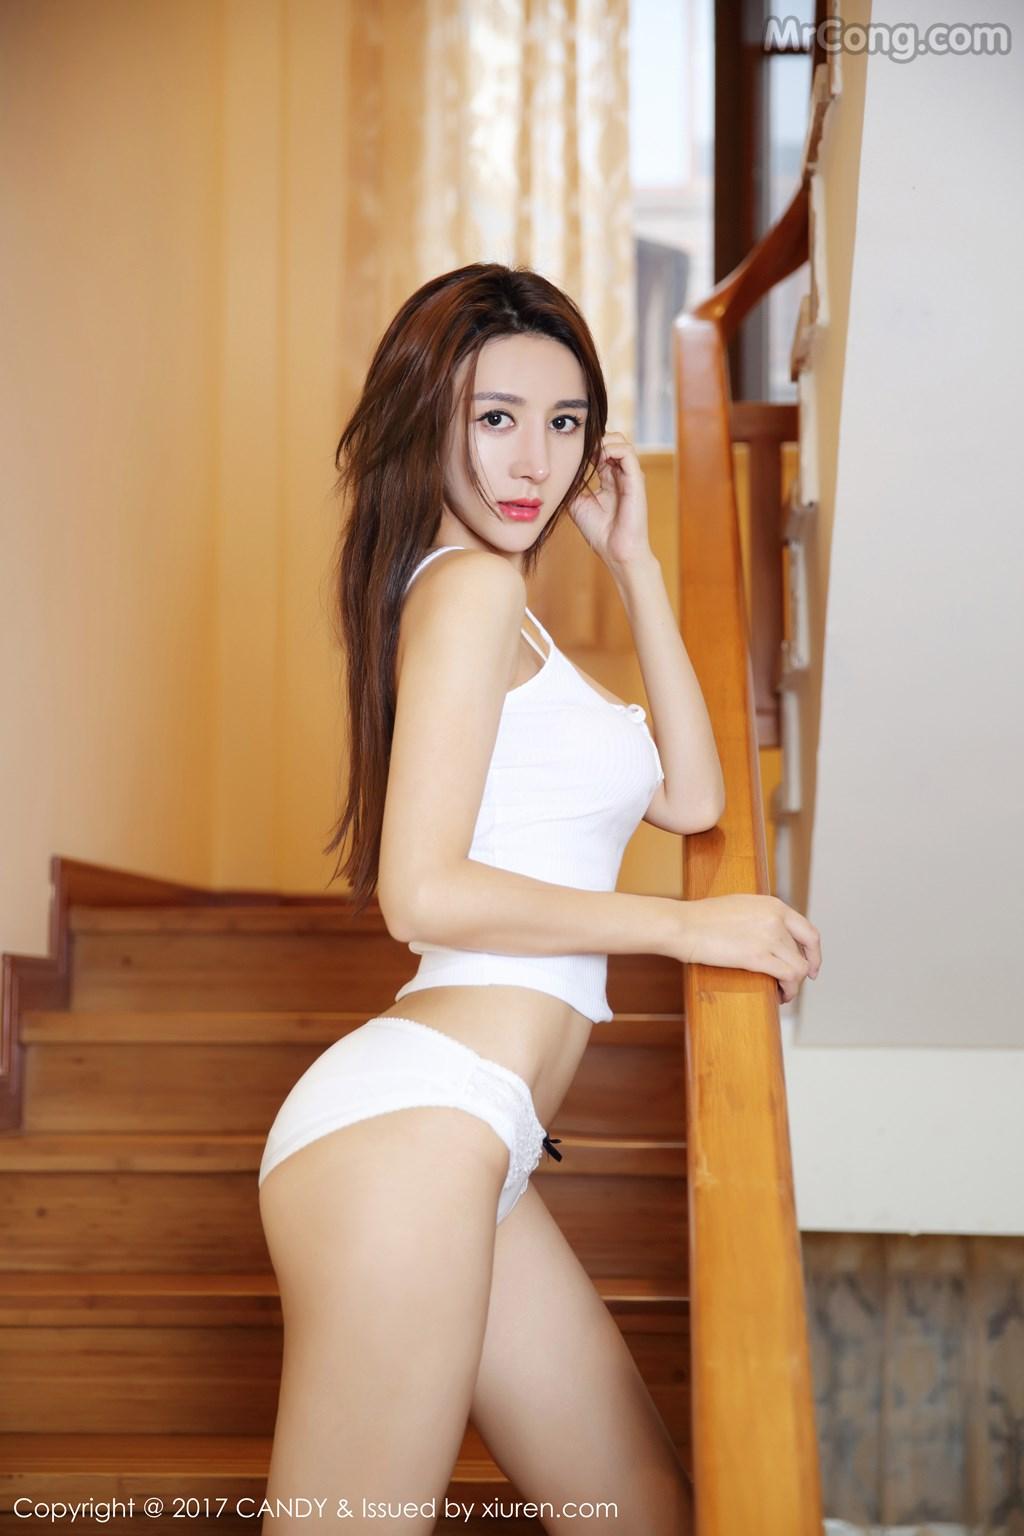 CANDY Vol.026: Model Yi Li Na (伊莉娜) (54 photos)